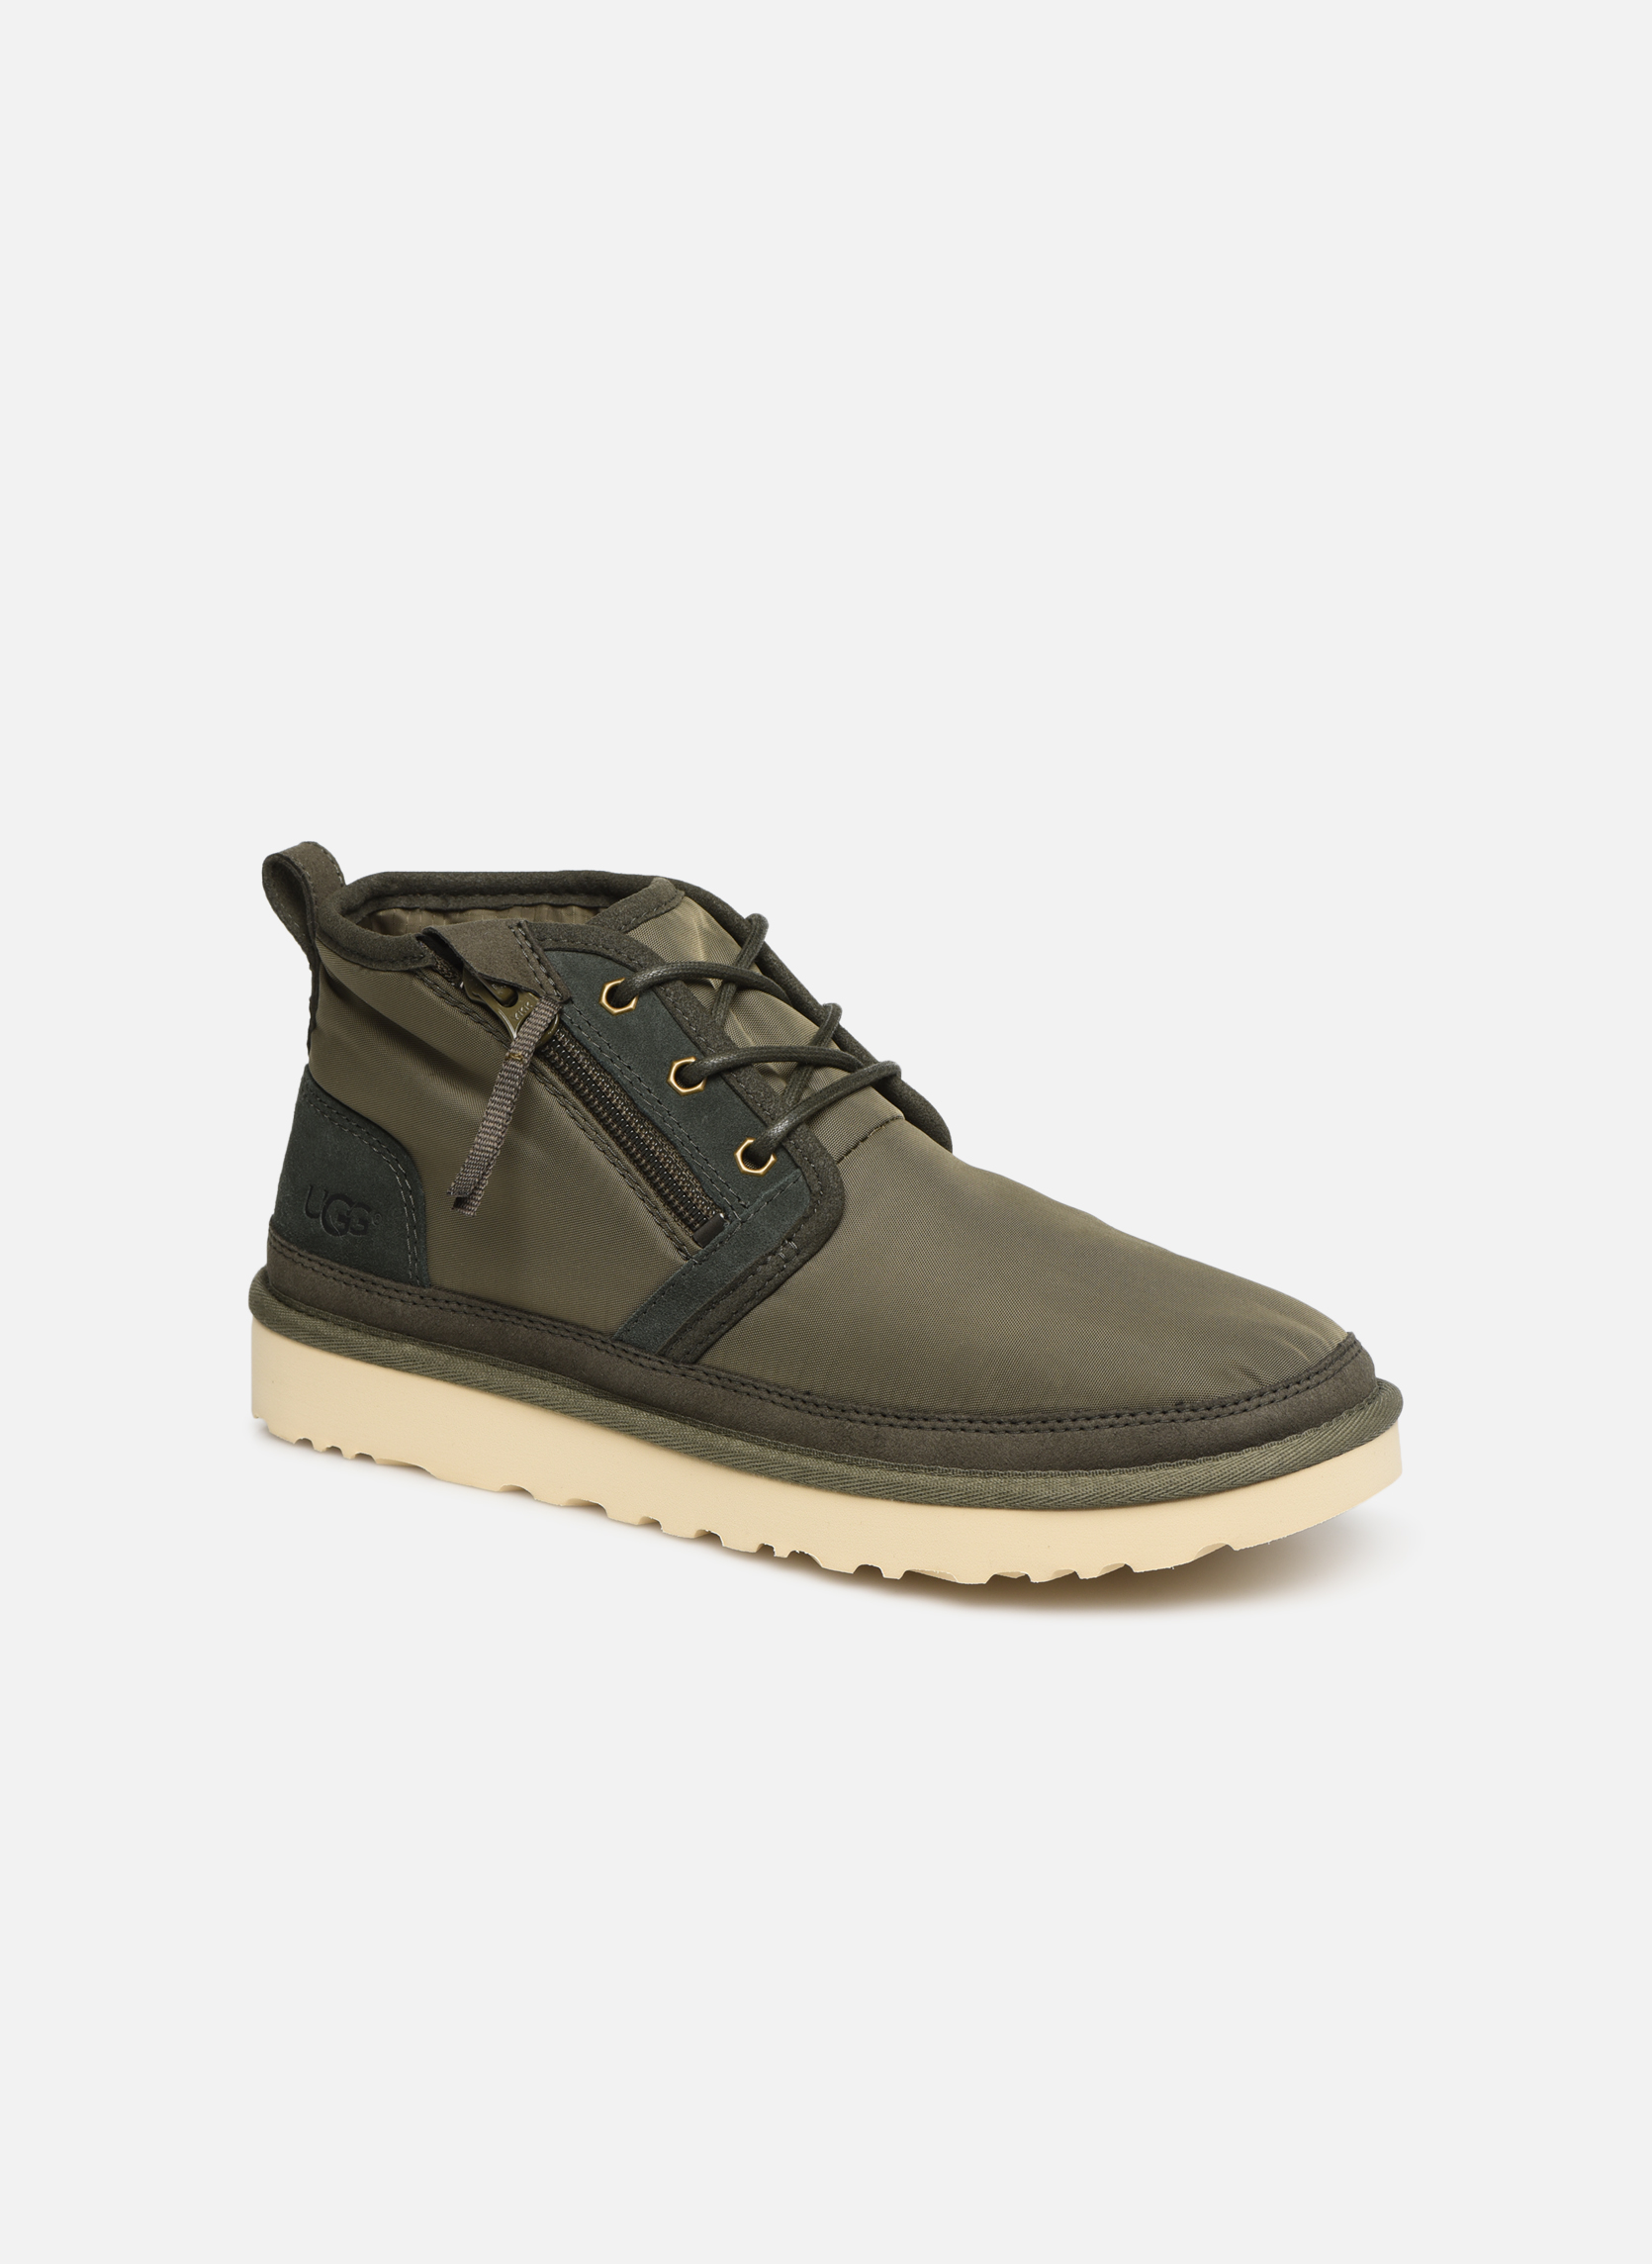 Sneakers UGG Groen